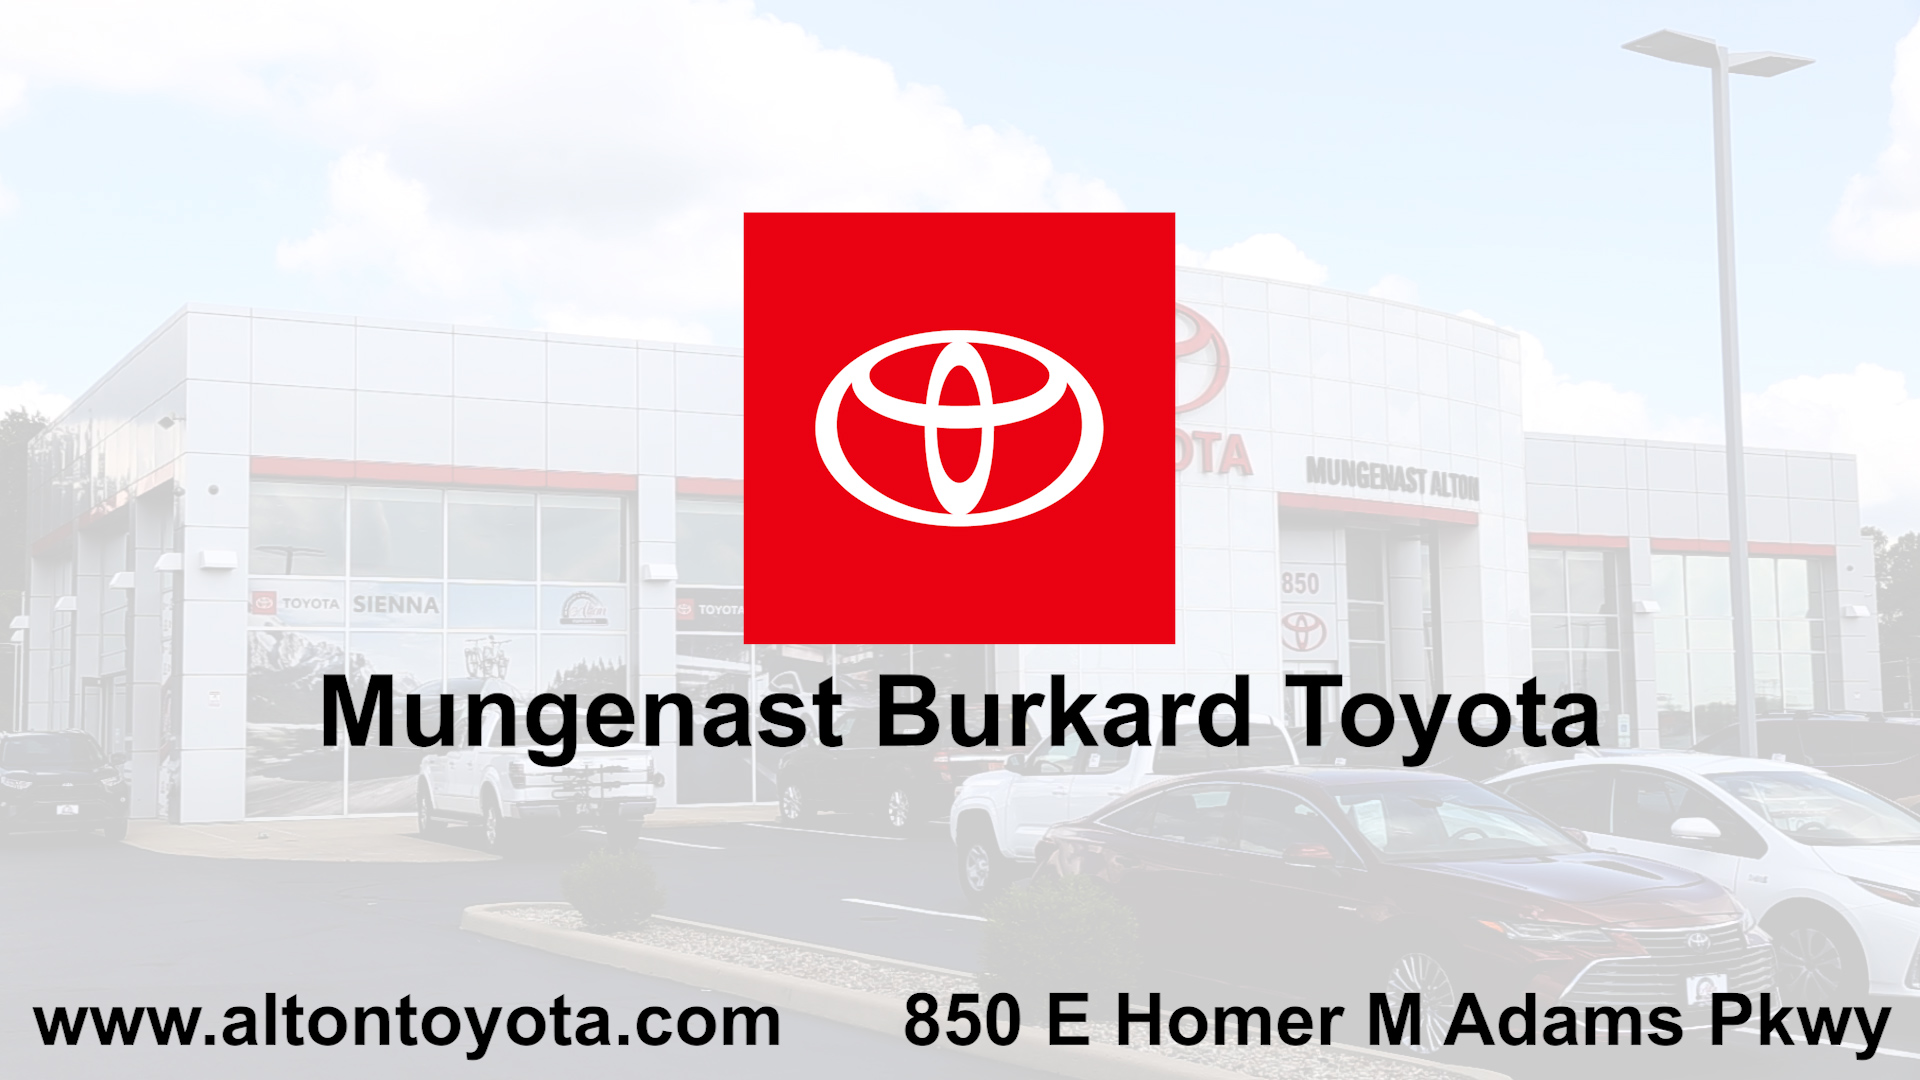 Mungenast Burkard Alton Toyota